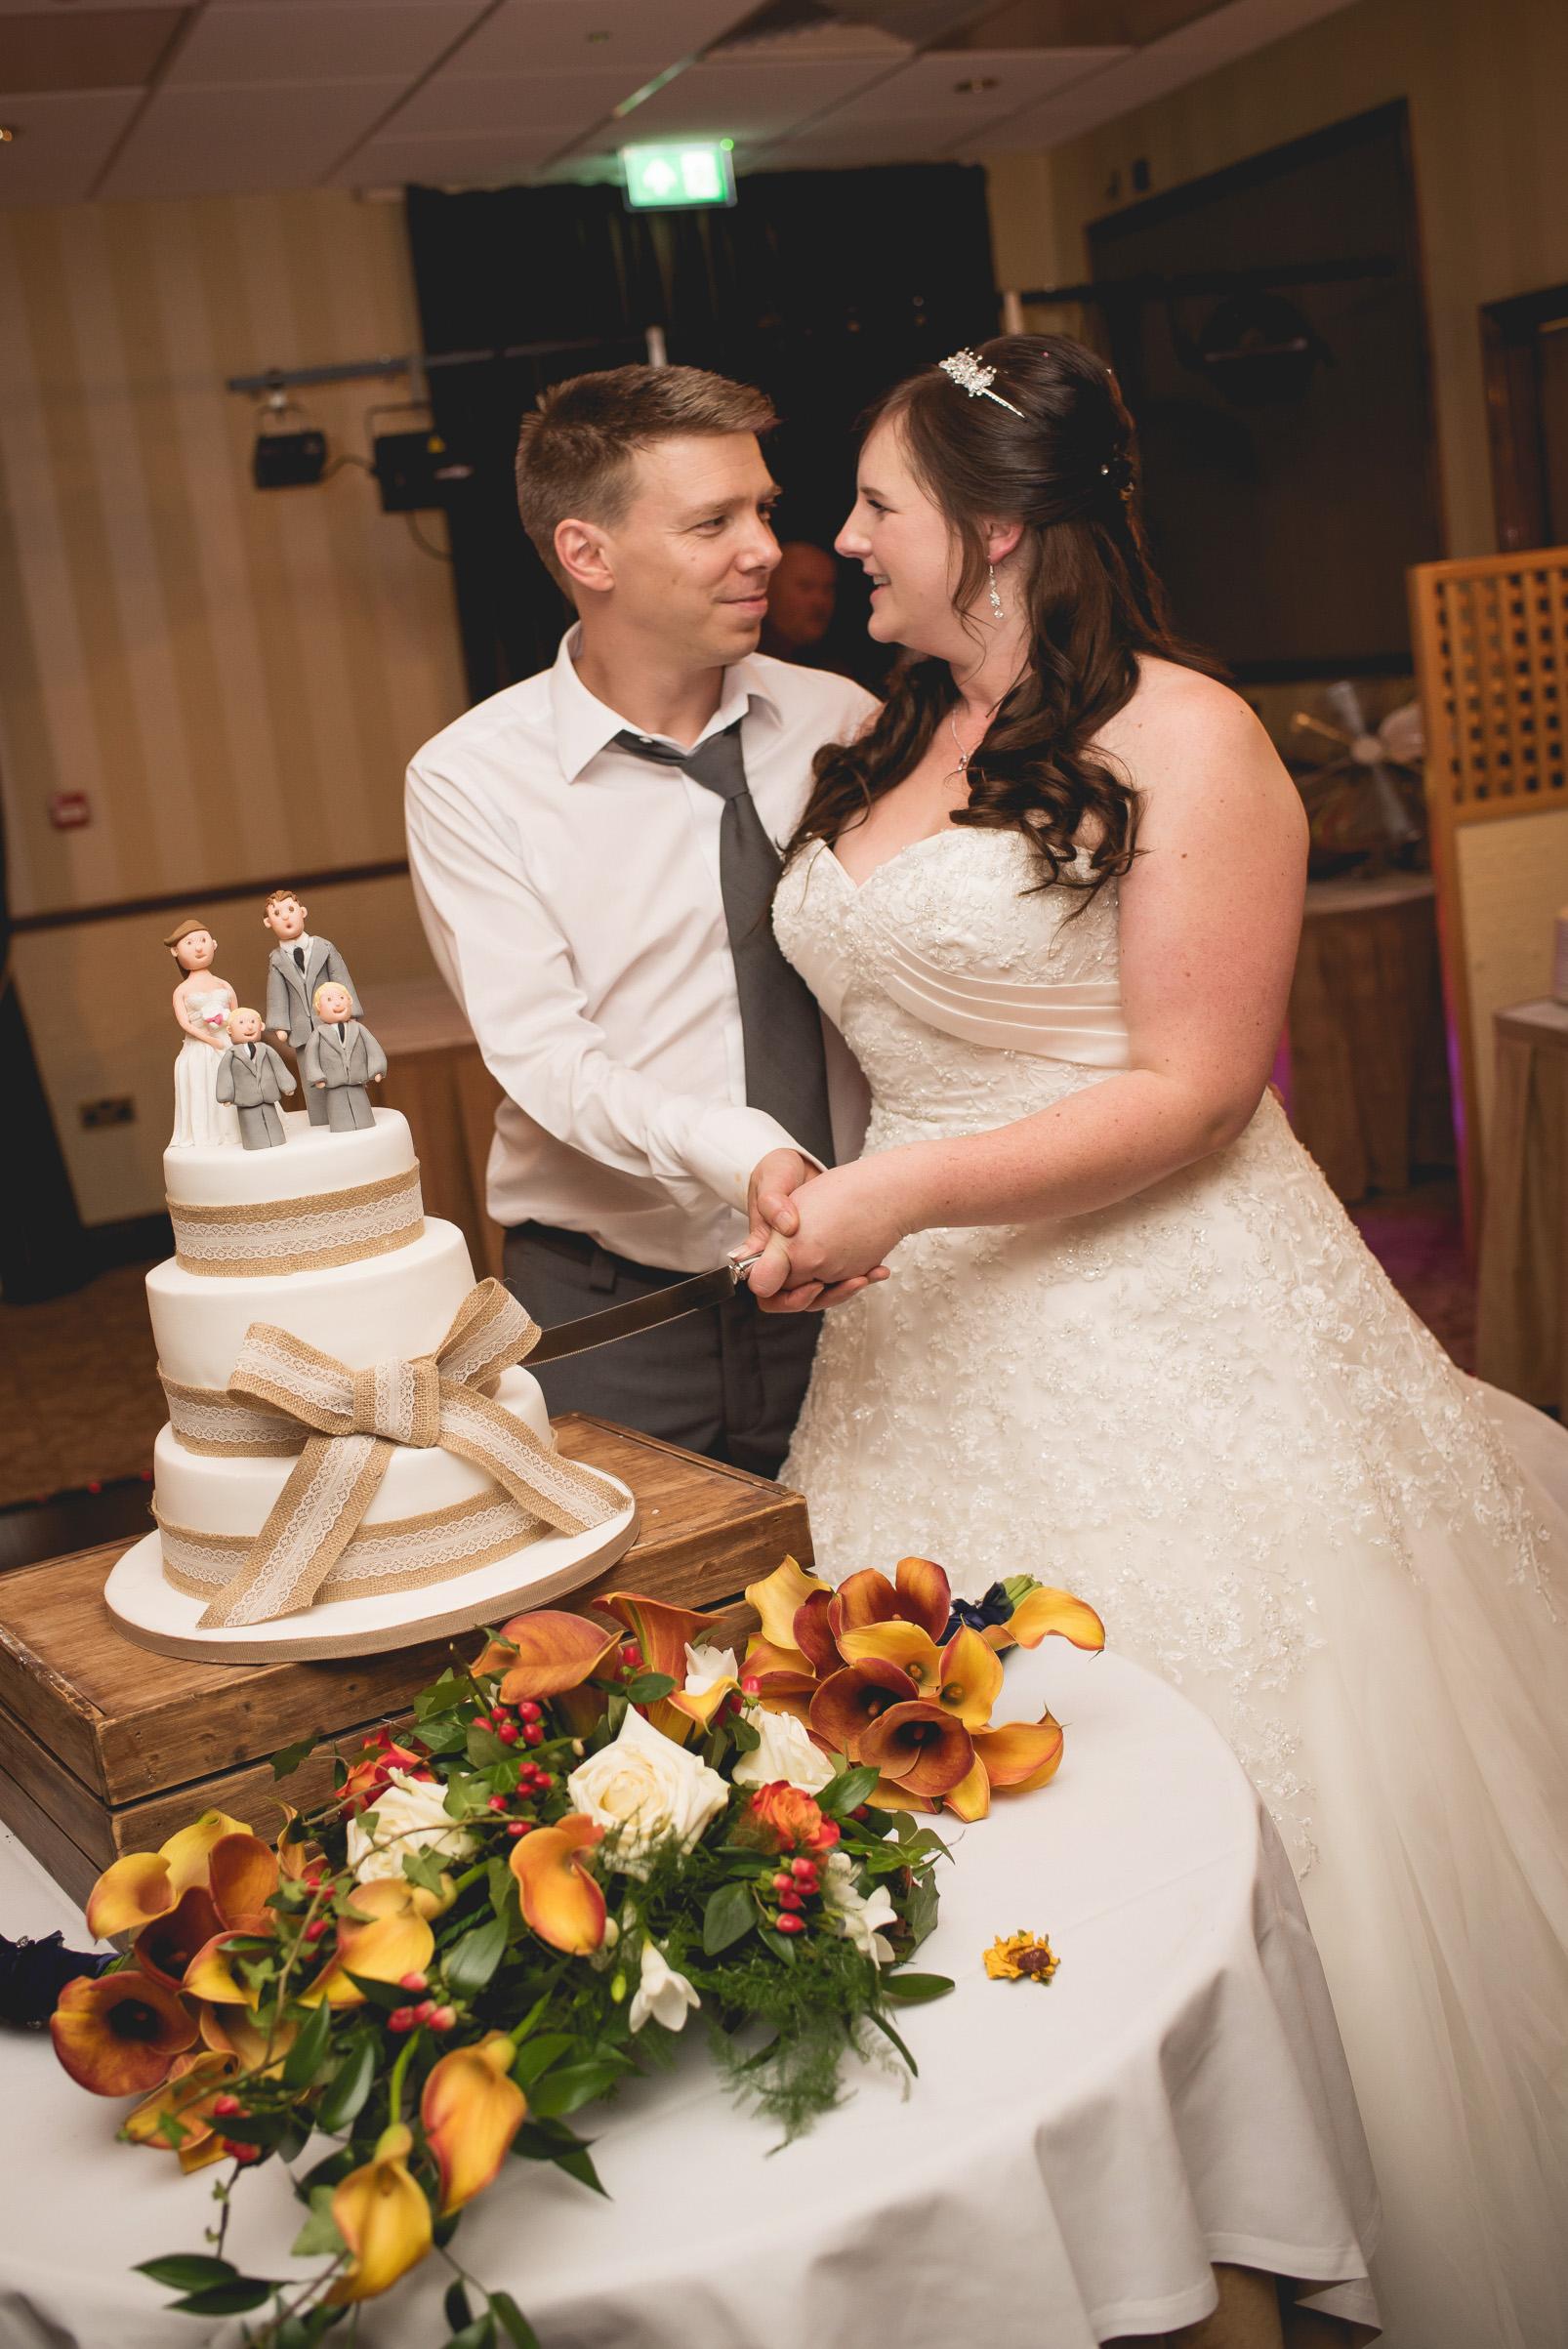 The+Fairlawns+wedding+Aldridge+StLukes+Church-212.jpg